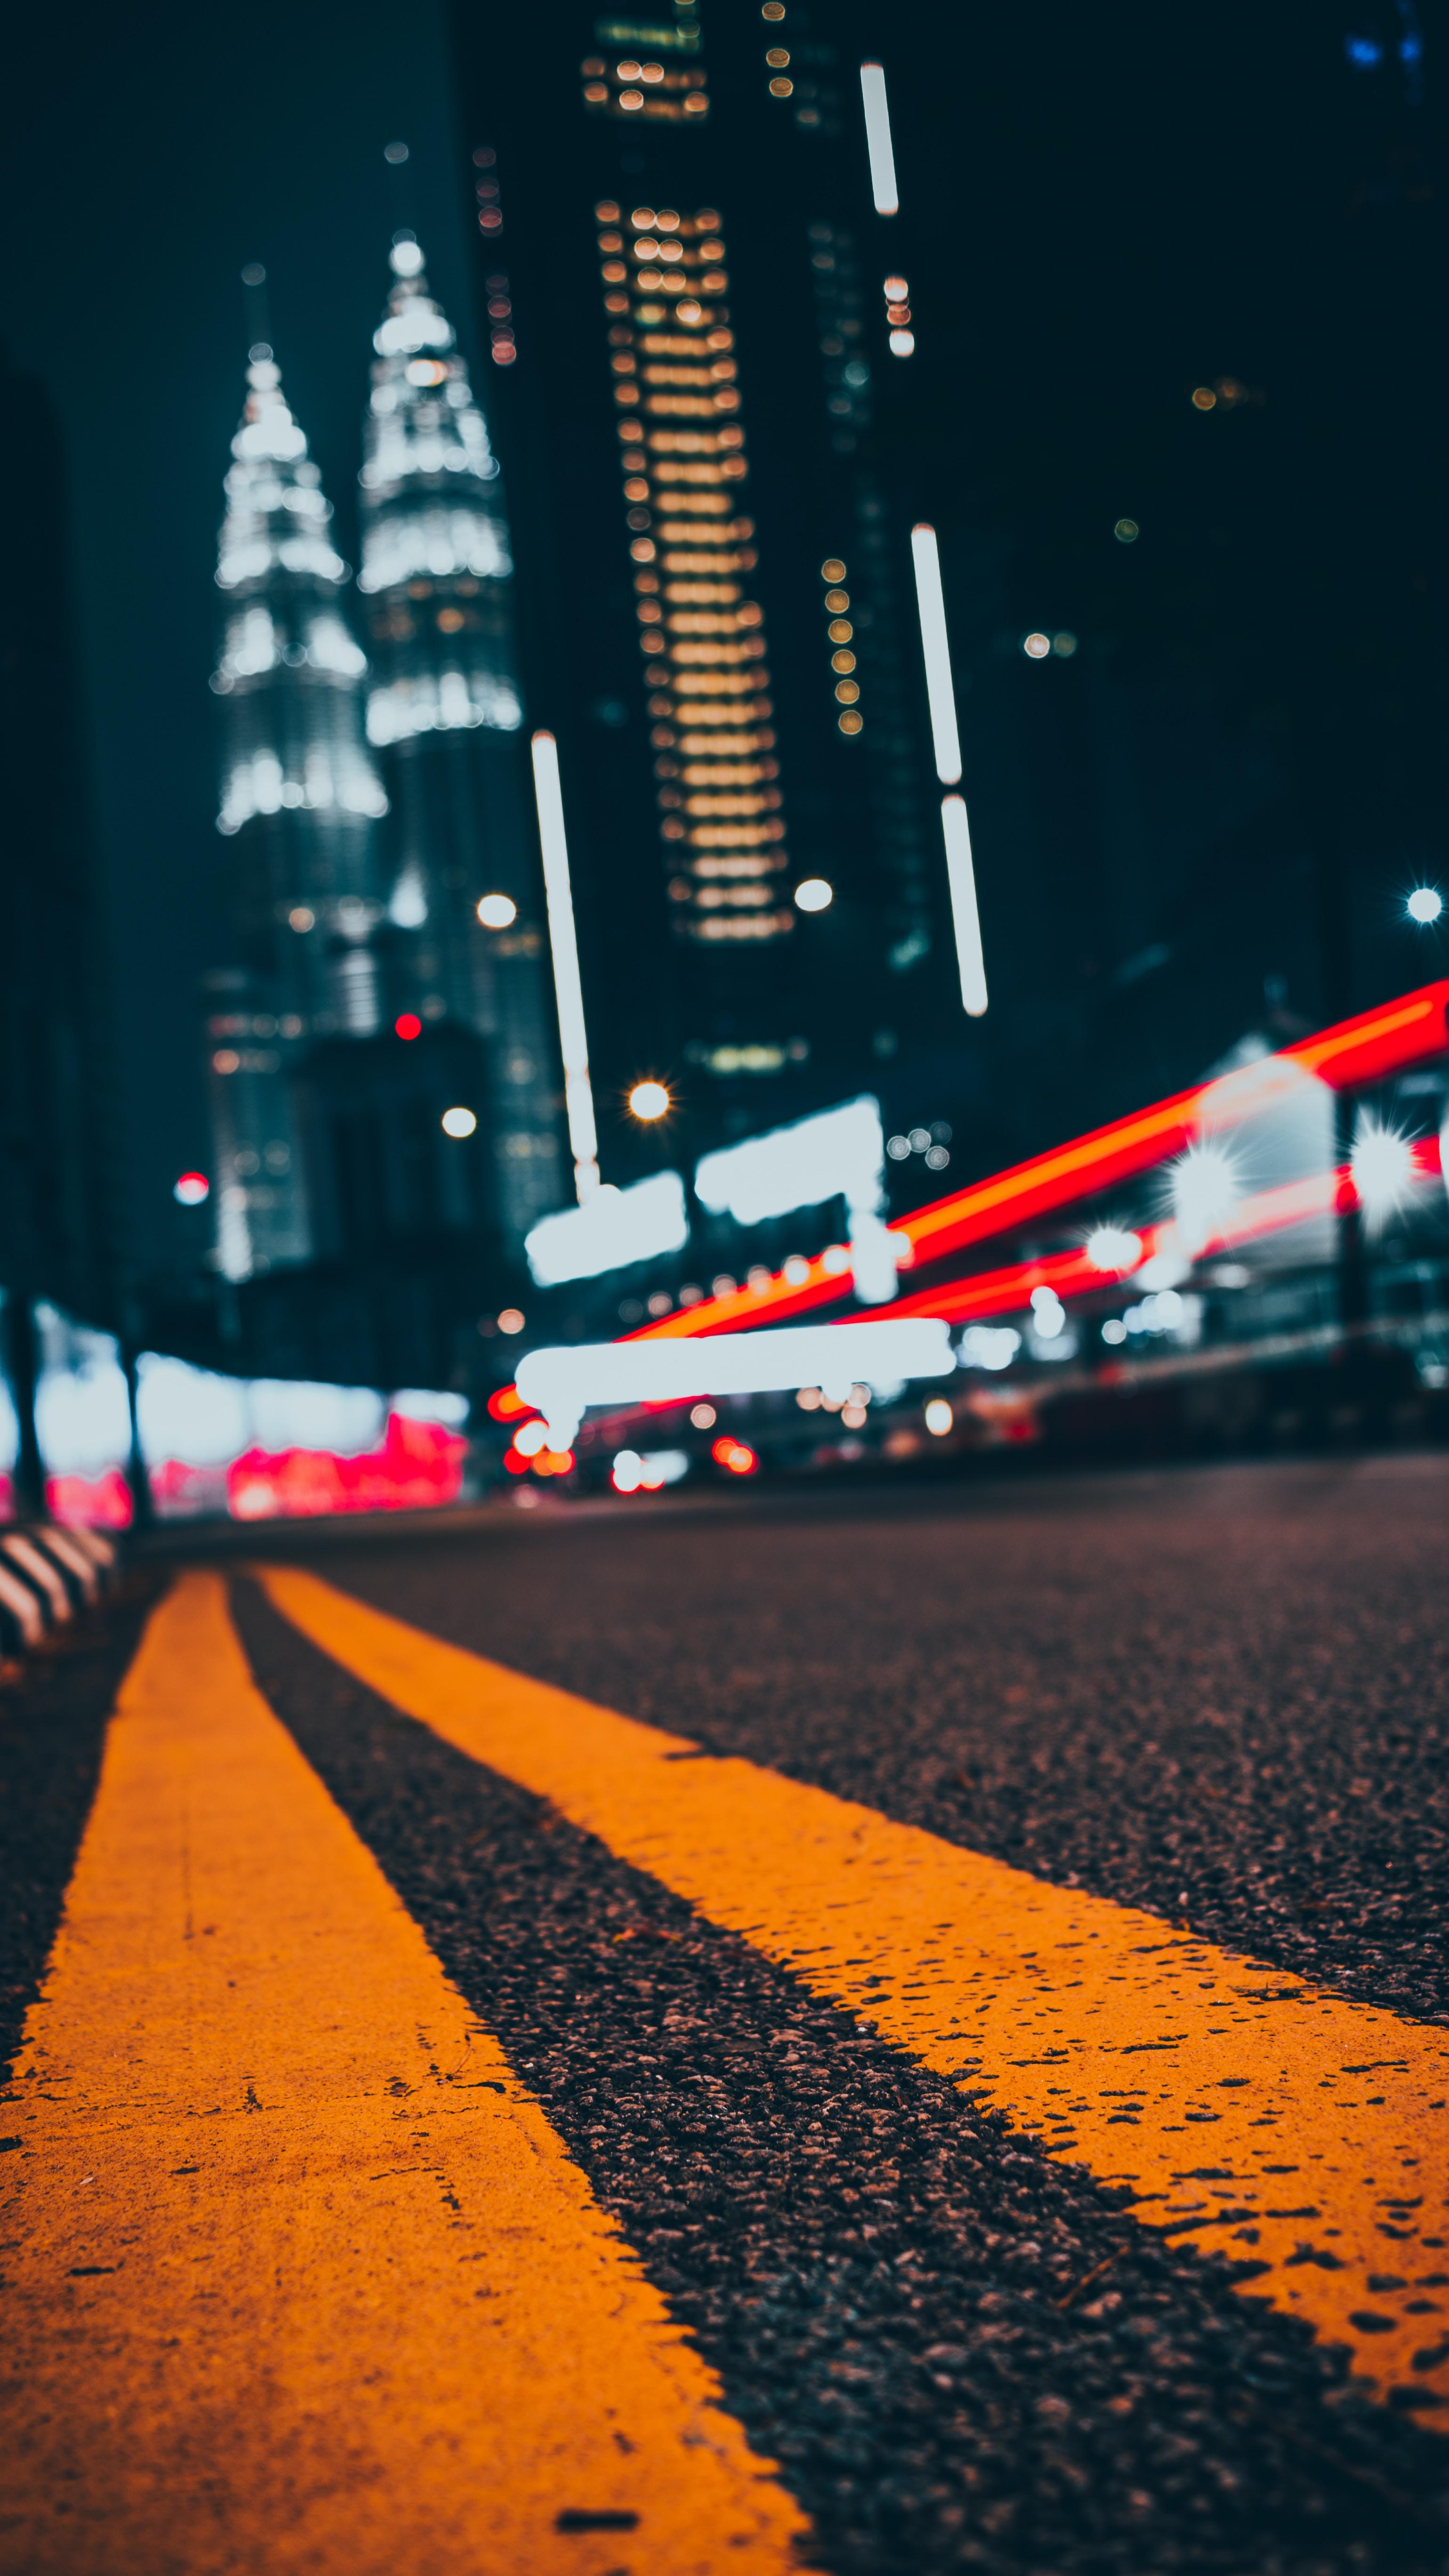 yellow pedestrian lane in road near concrete building during nighttime